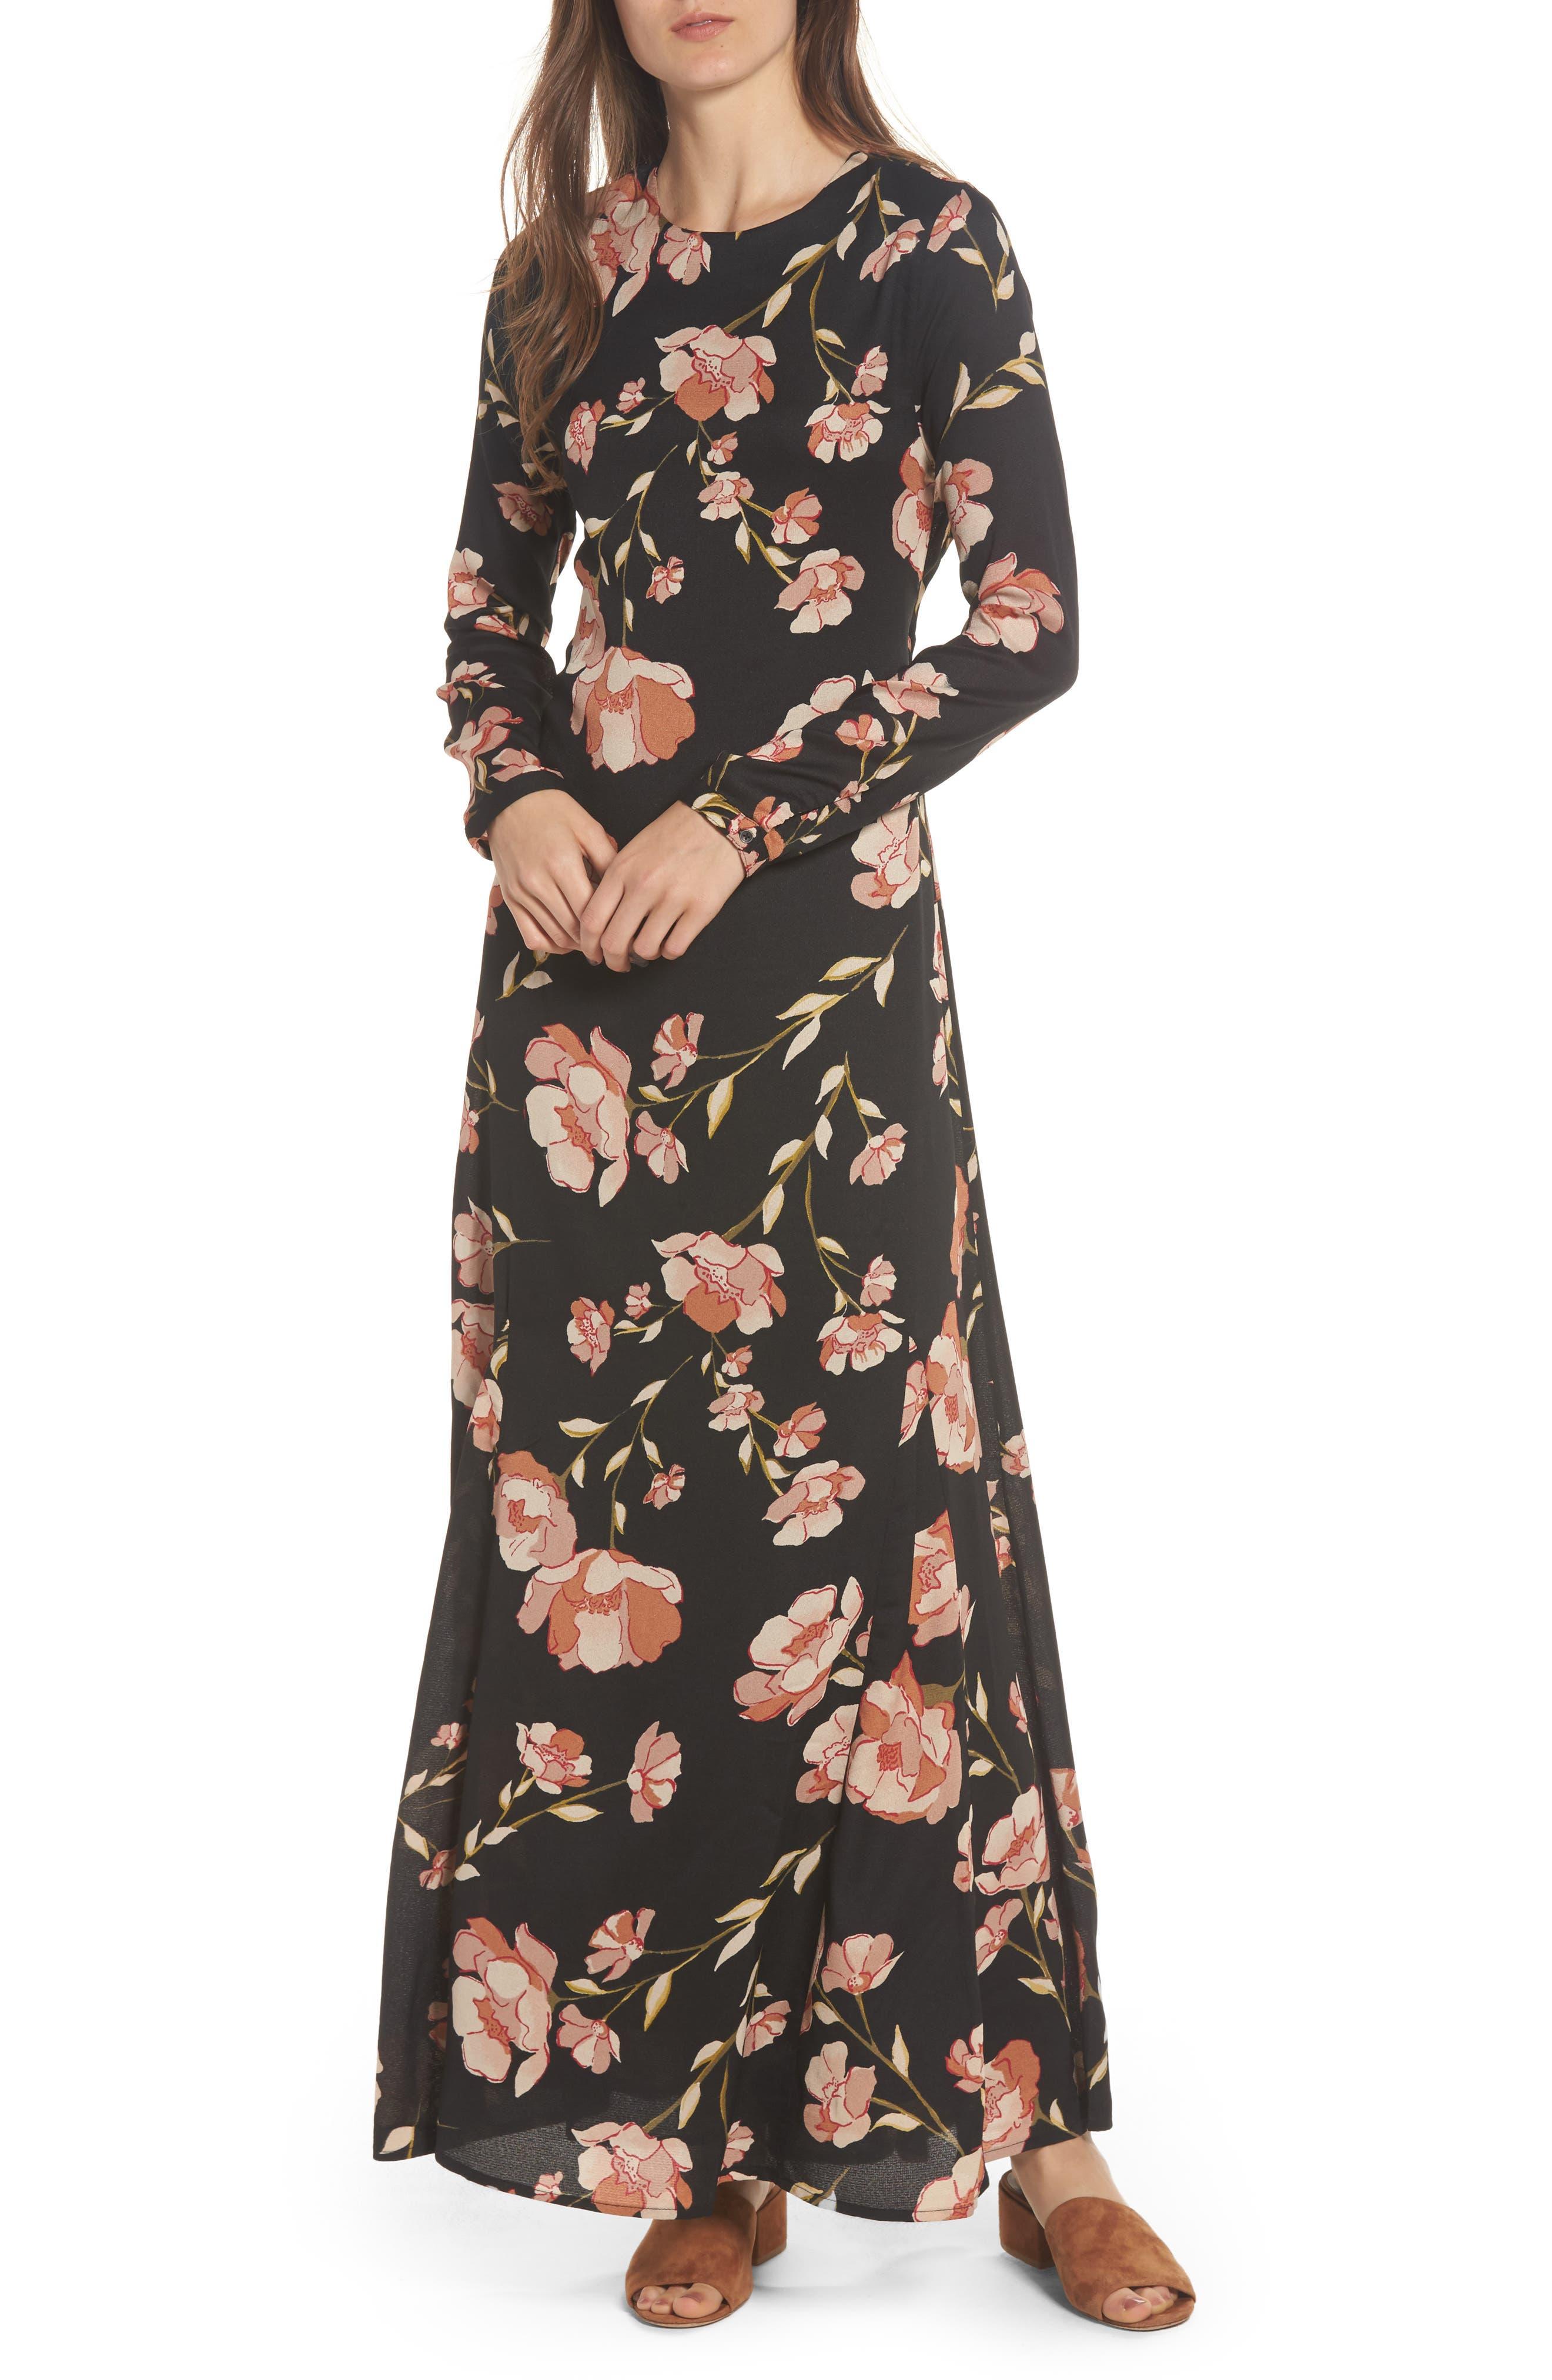 Alternate Image 1 Selected - Love Like Summer x Billabong Floral Print Maxi Dress